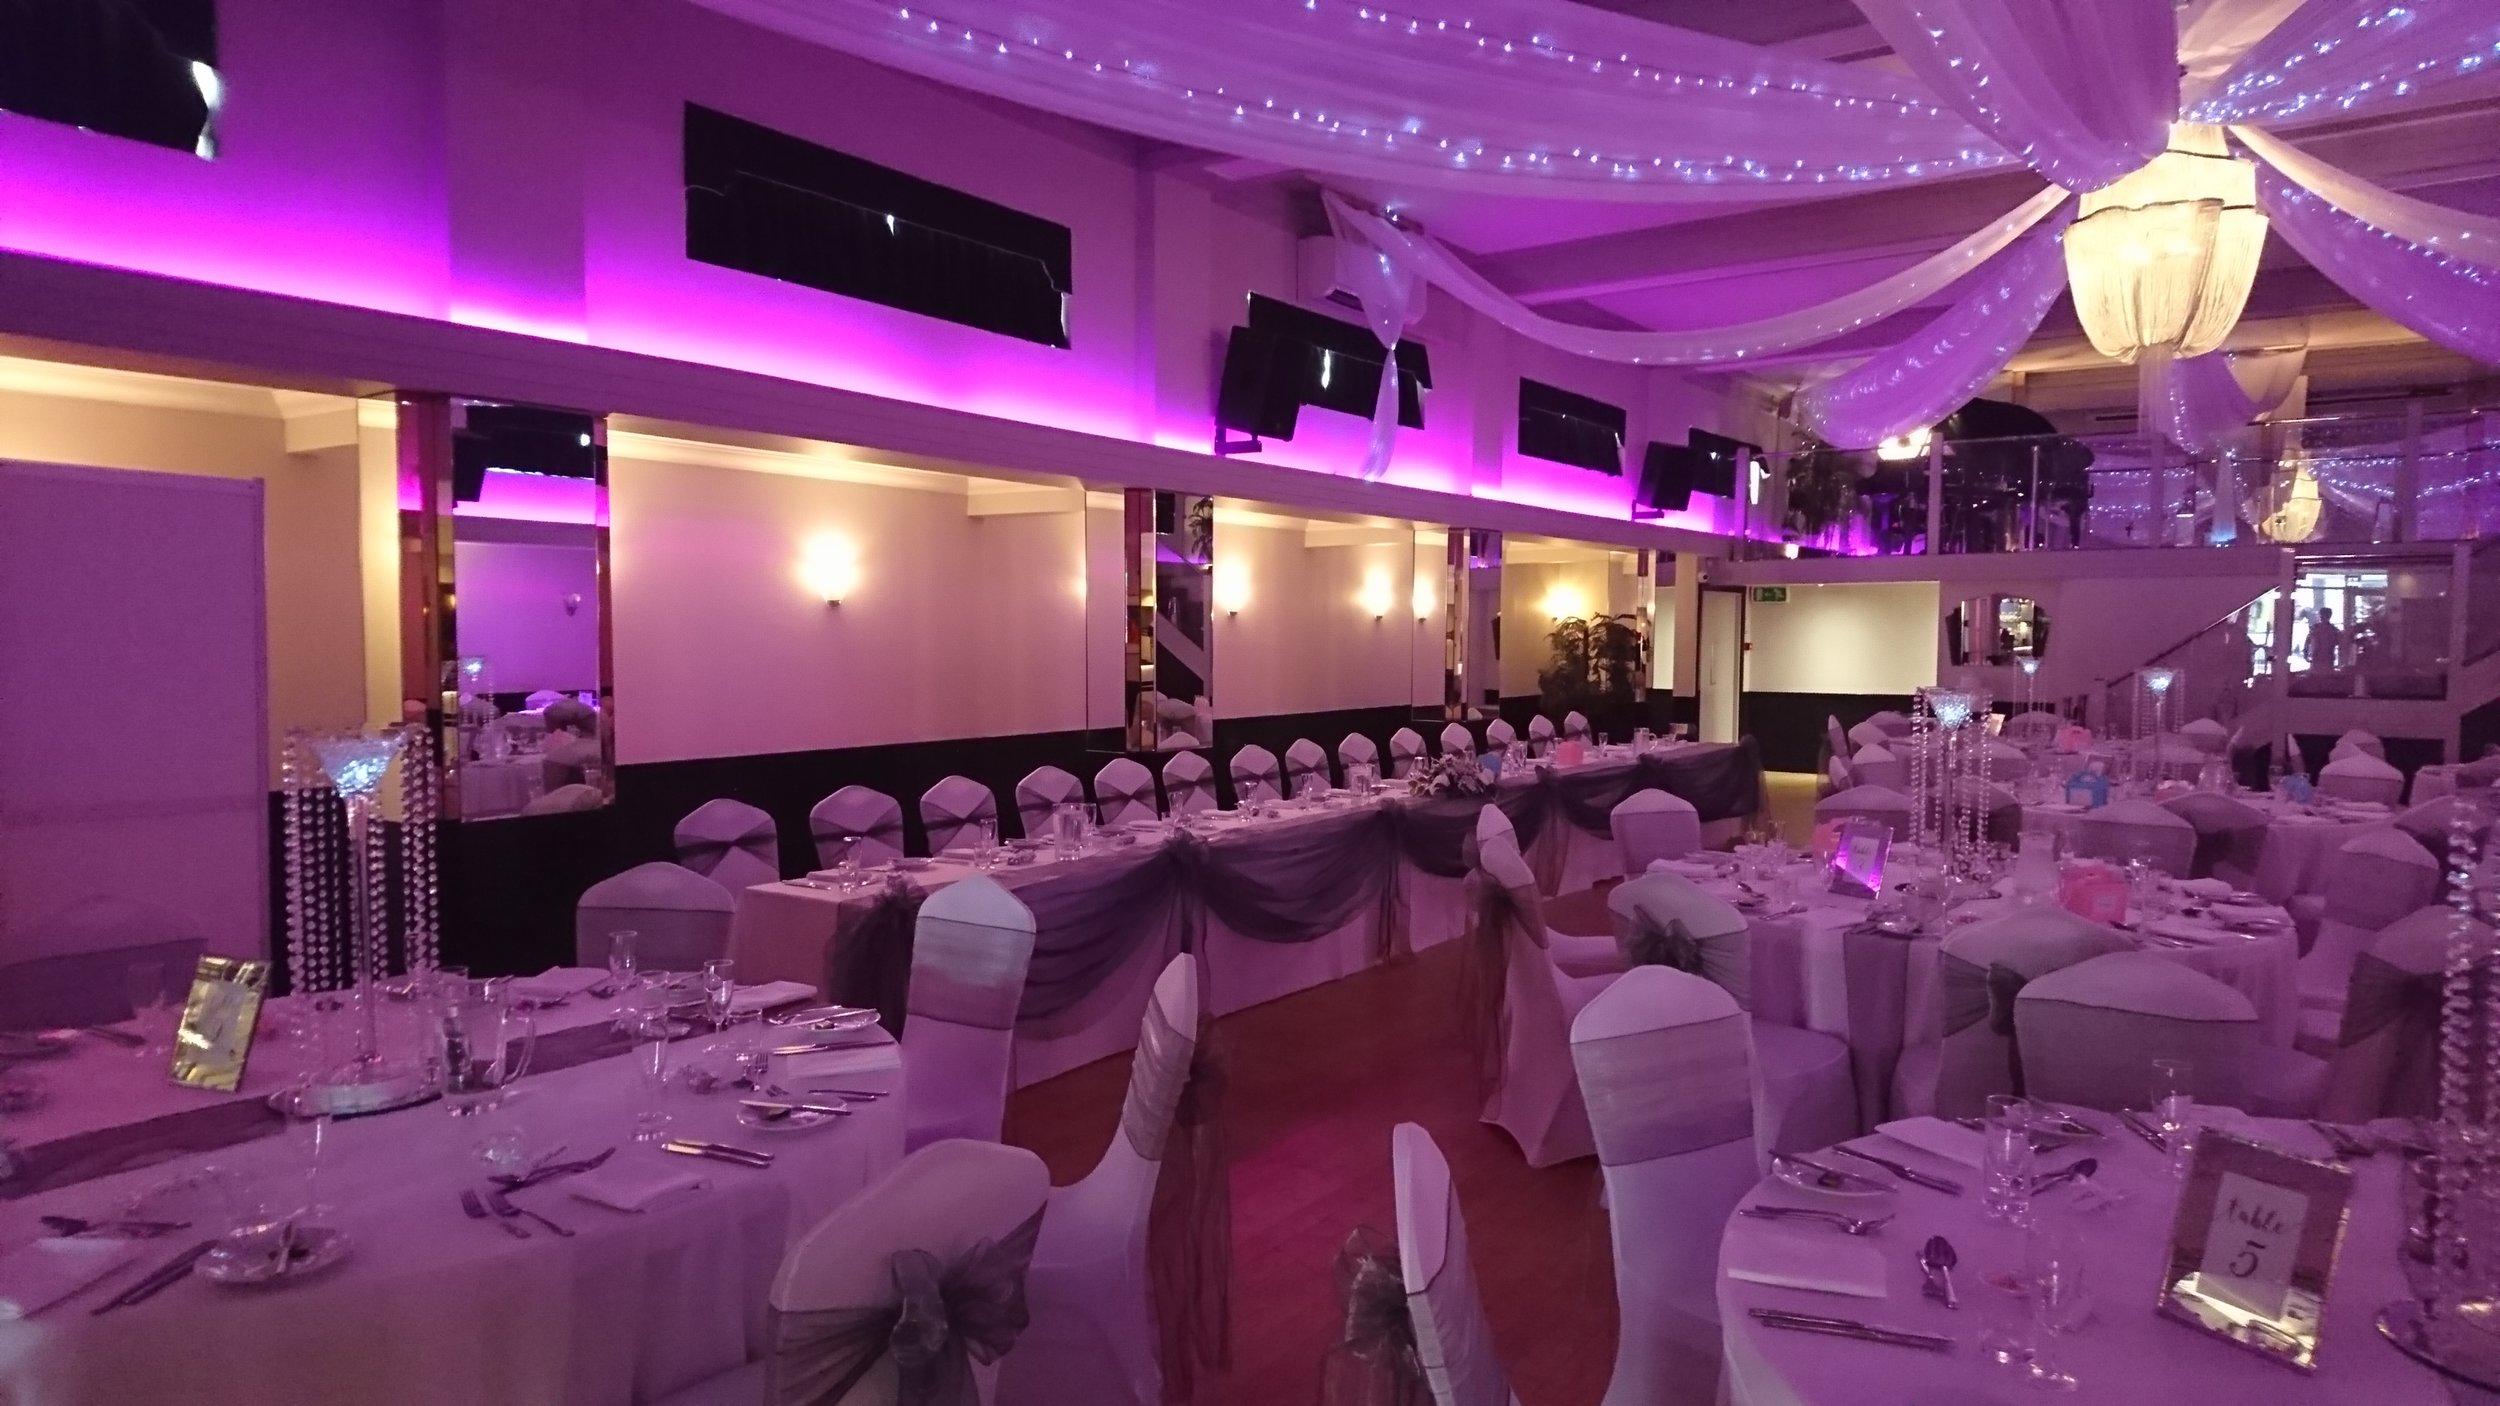 Pink Wedding Reception, Rosie and Daniel, 24th August 2019 - The Arlington Ballroom Essex